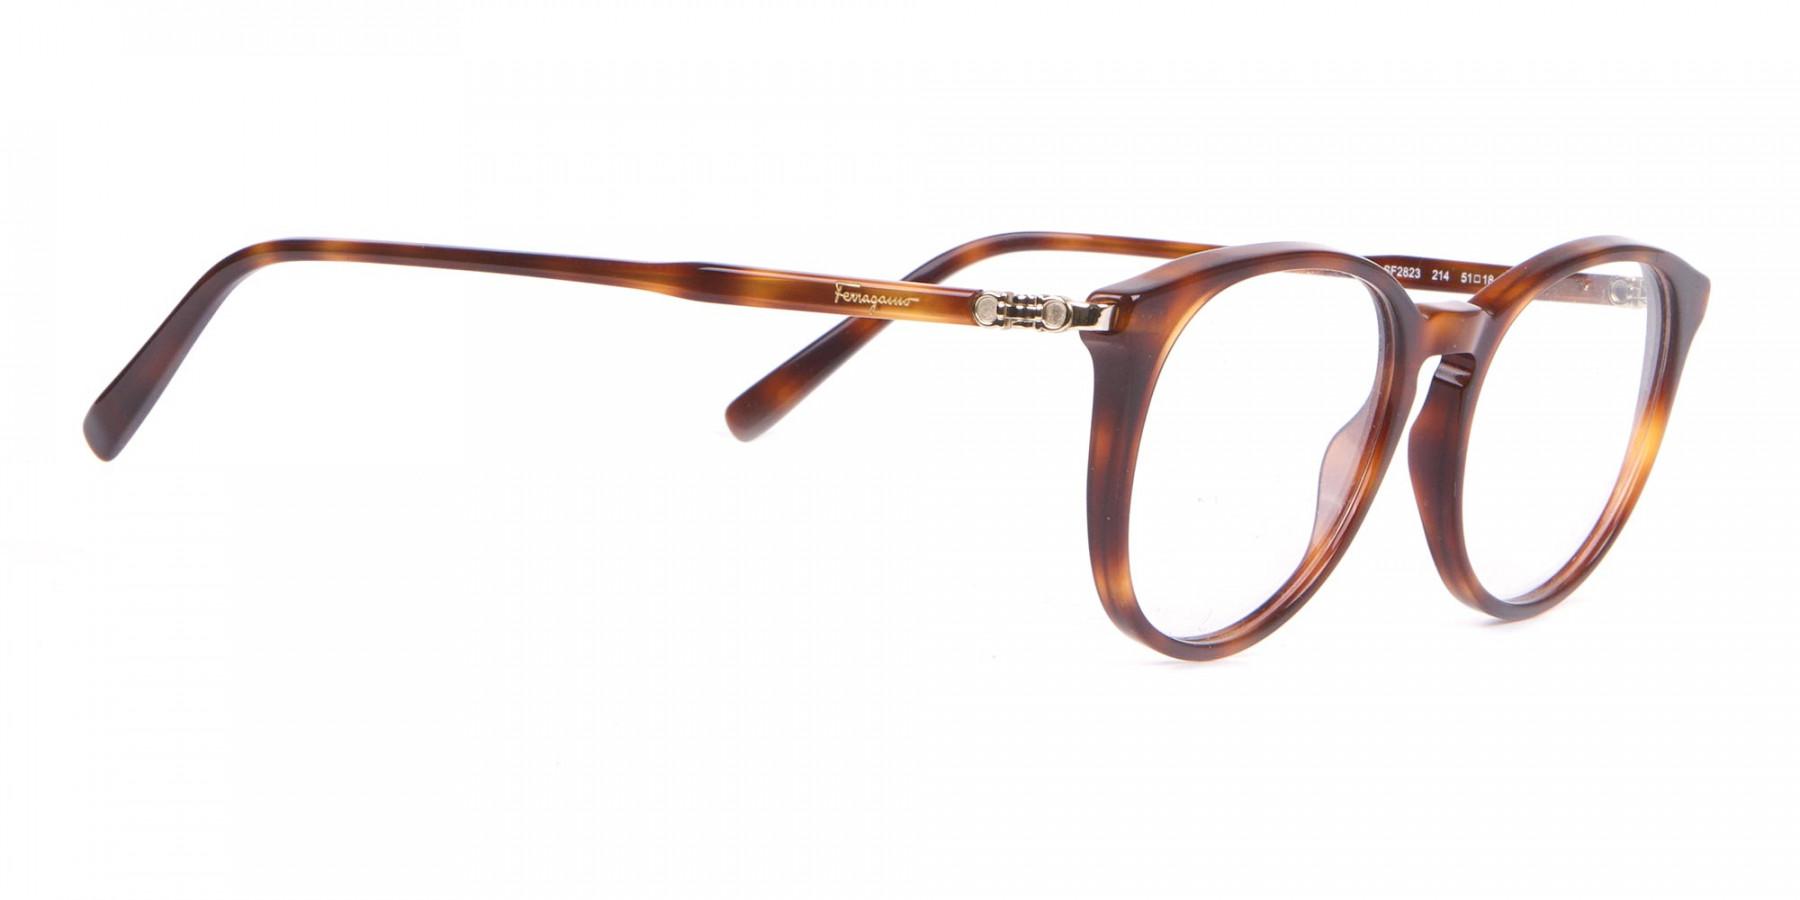 Salvatore Ferragamo SF2123 Retro Round Glasses Tortoise-1